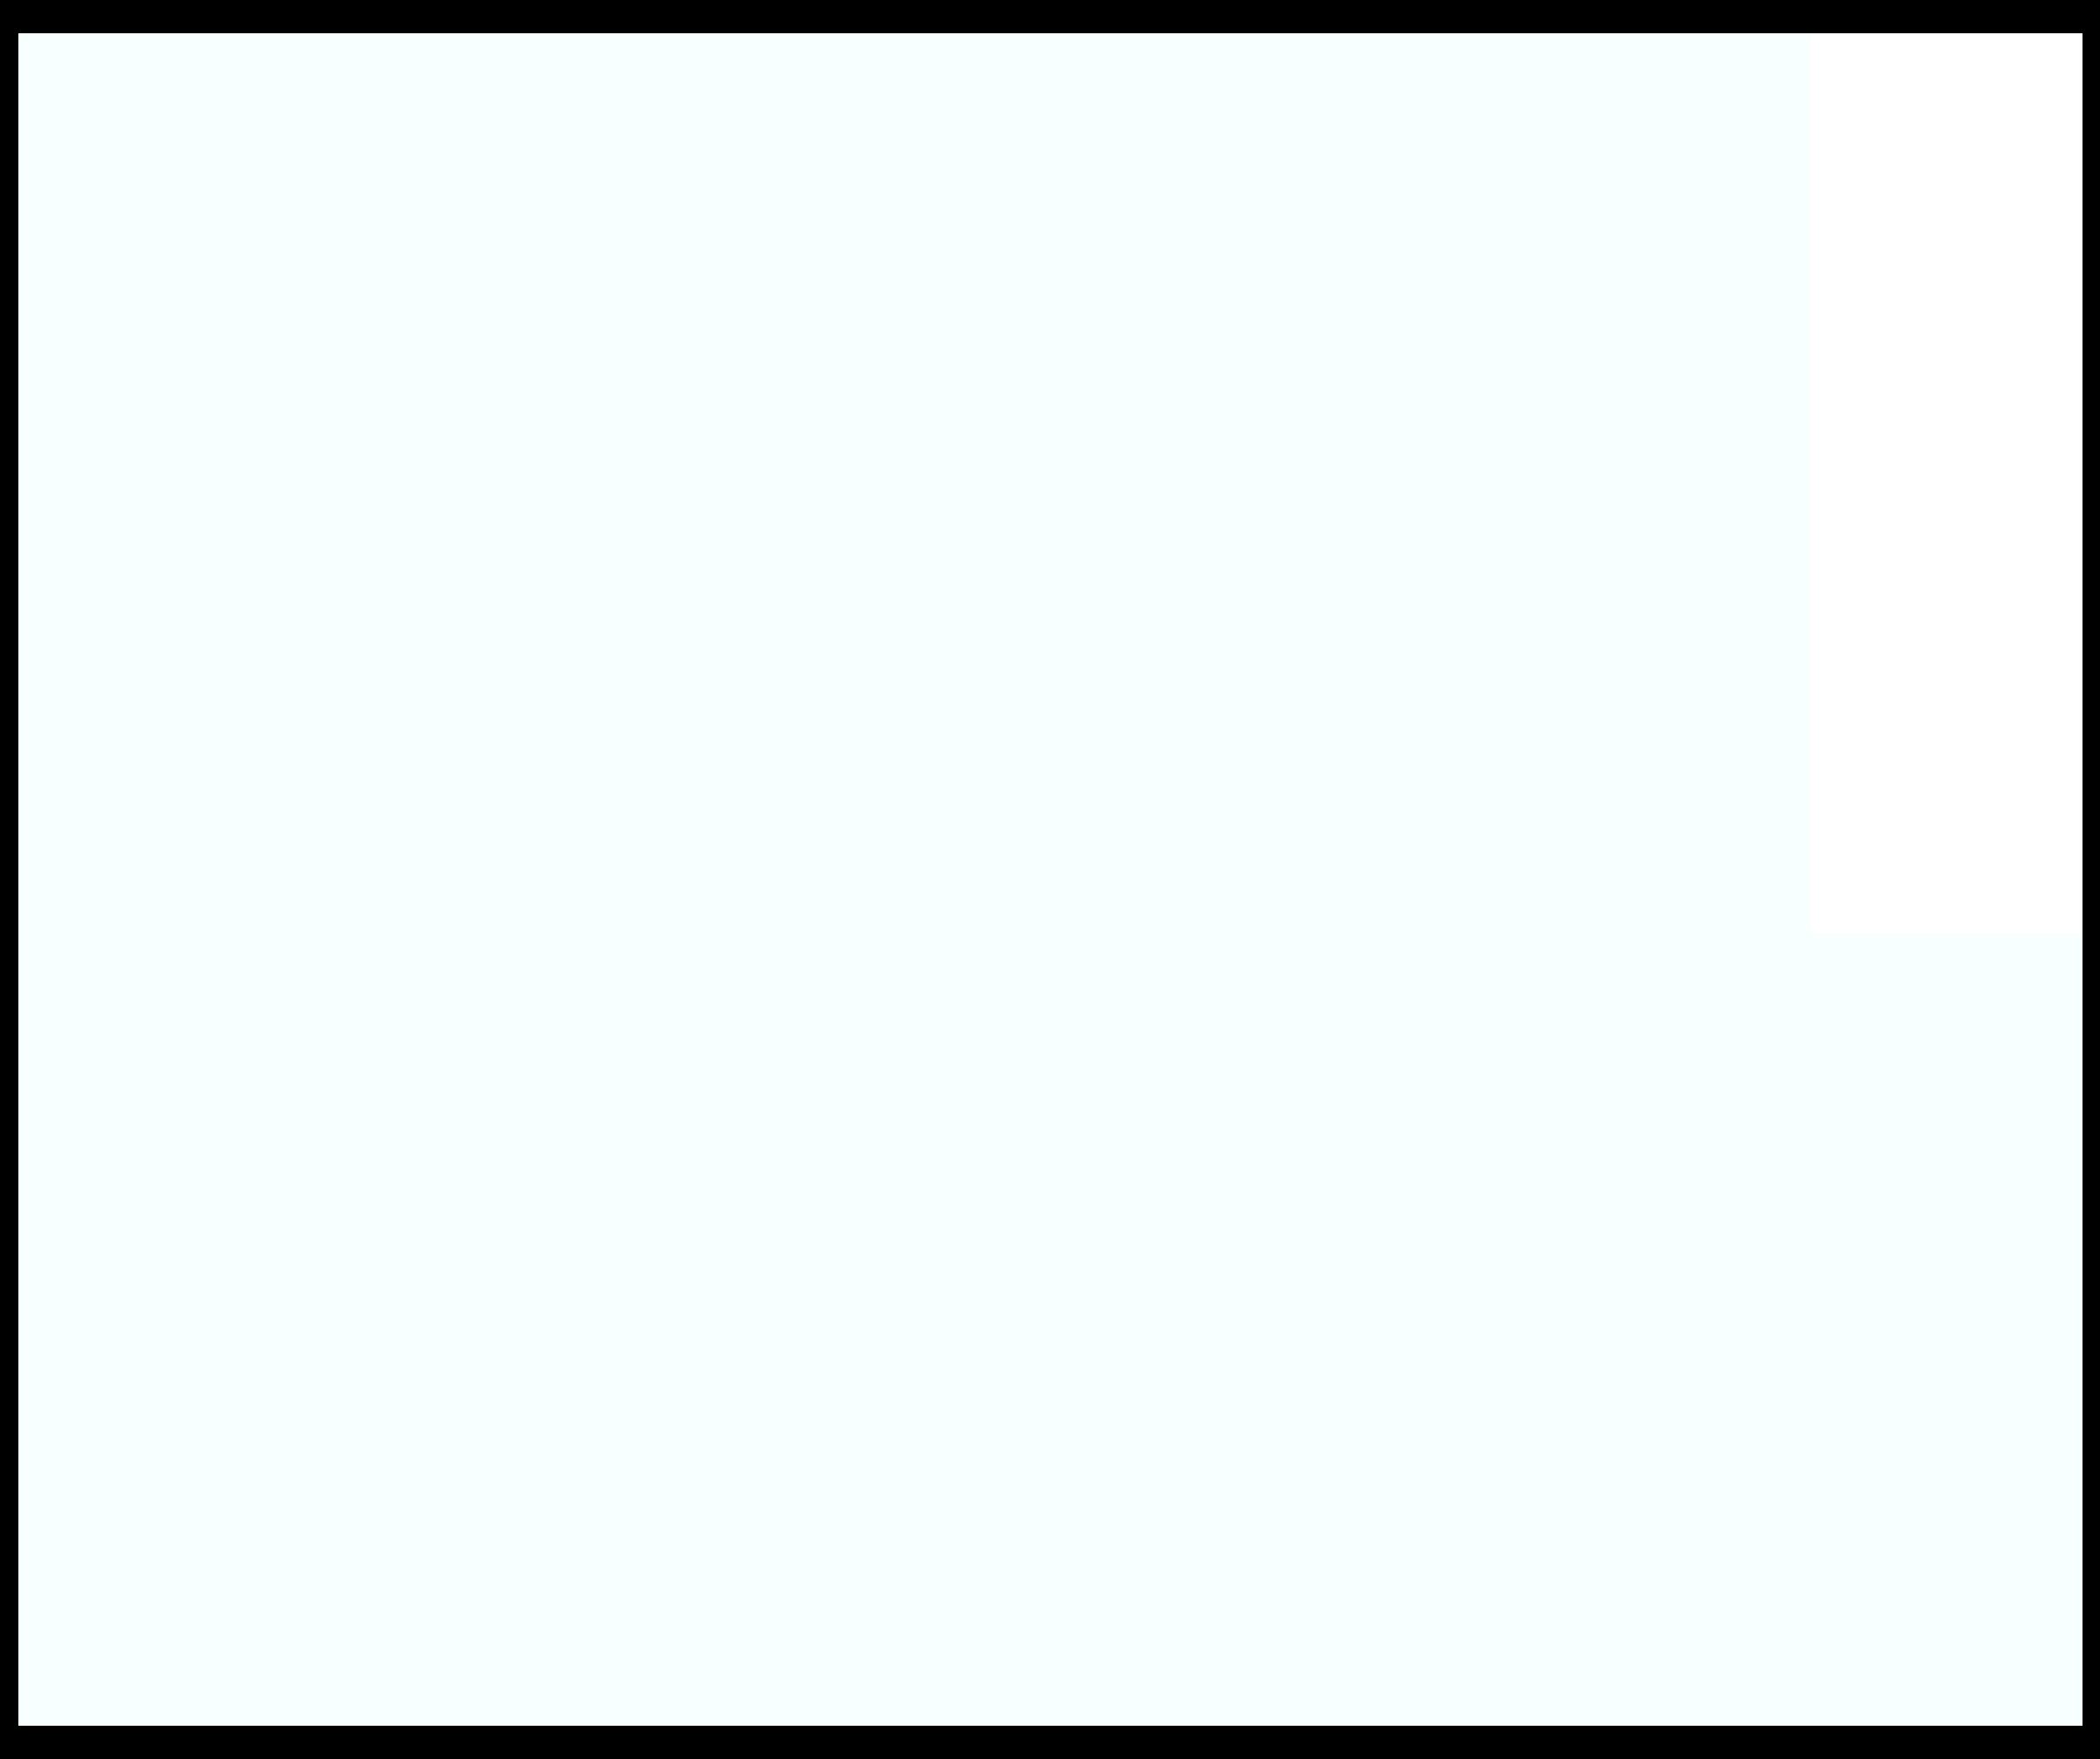 Salari Advogados   Advogados para Empresas RJ